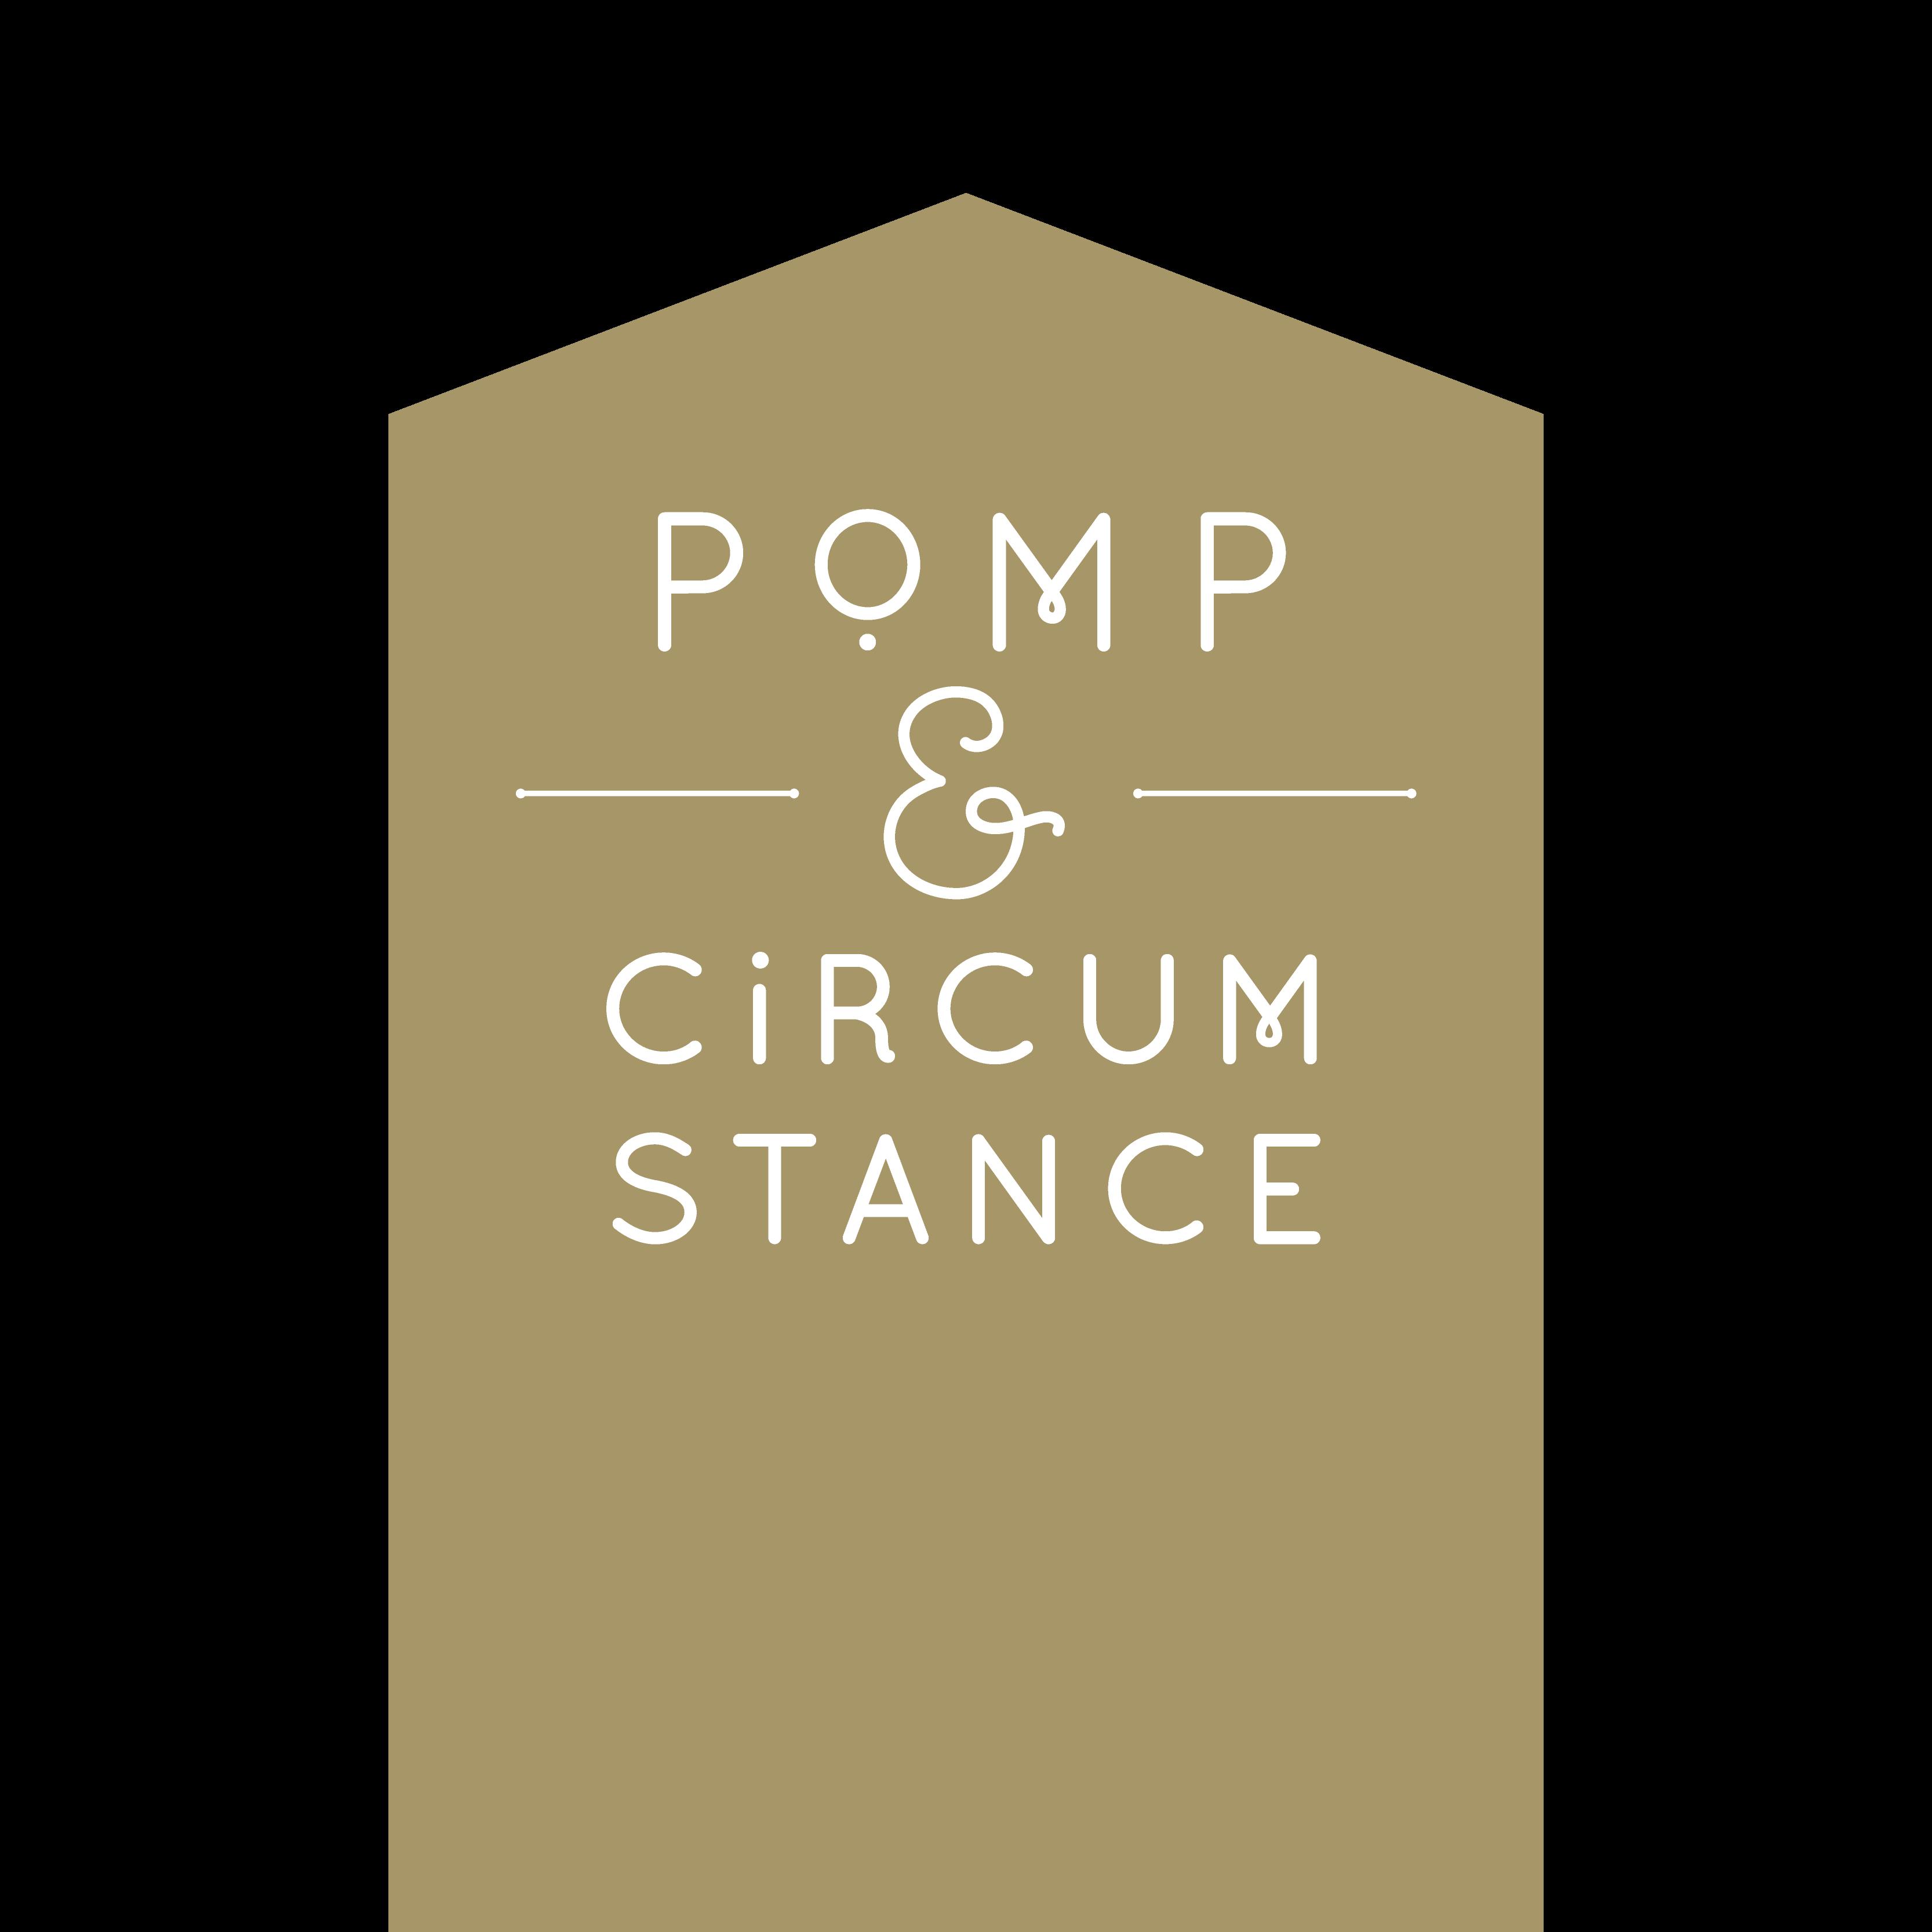 Pomp & Circumstance Events - Pomp & Circumstance Events